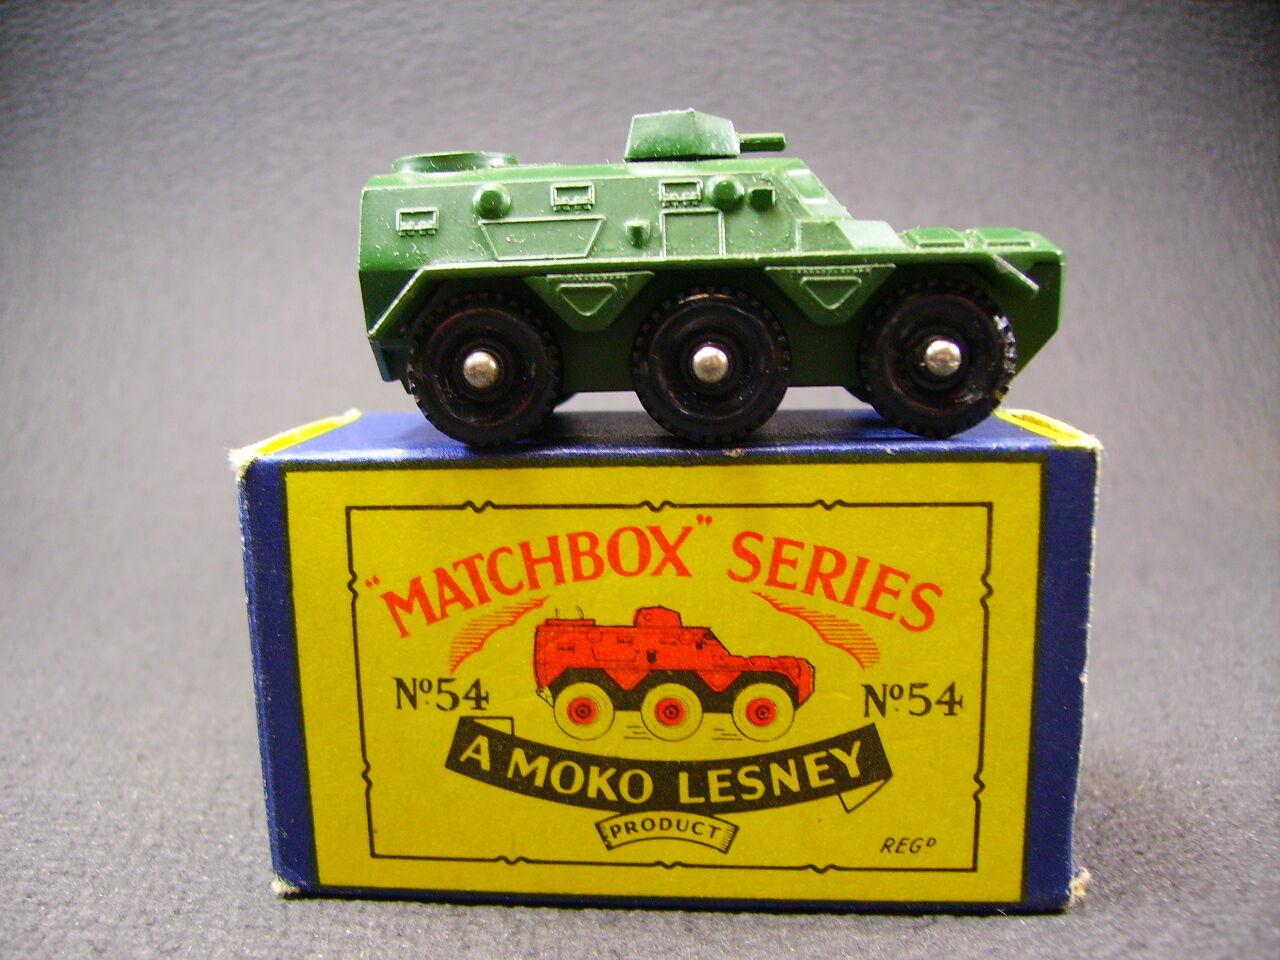 Matchbox Lesney Moko saracen personnel carrier 54a (1958) + england